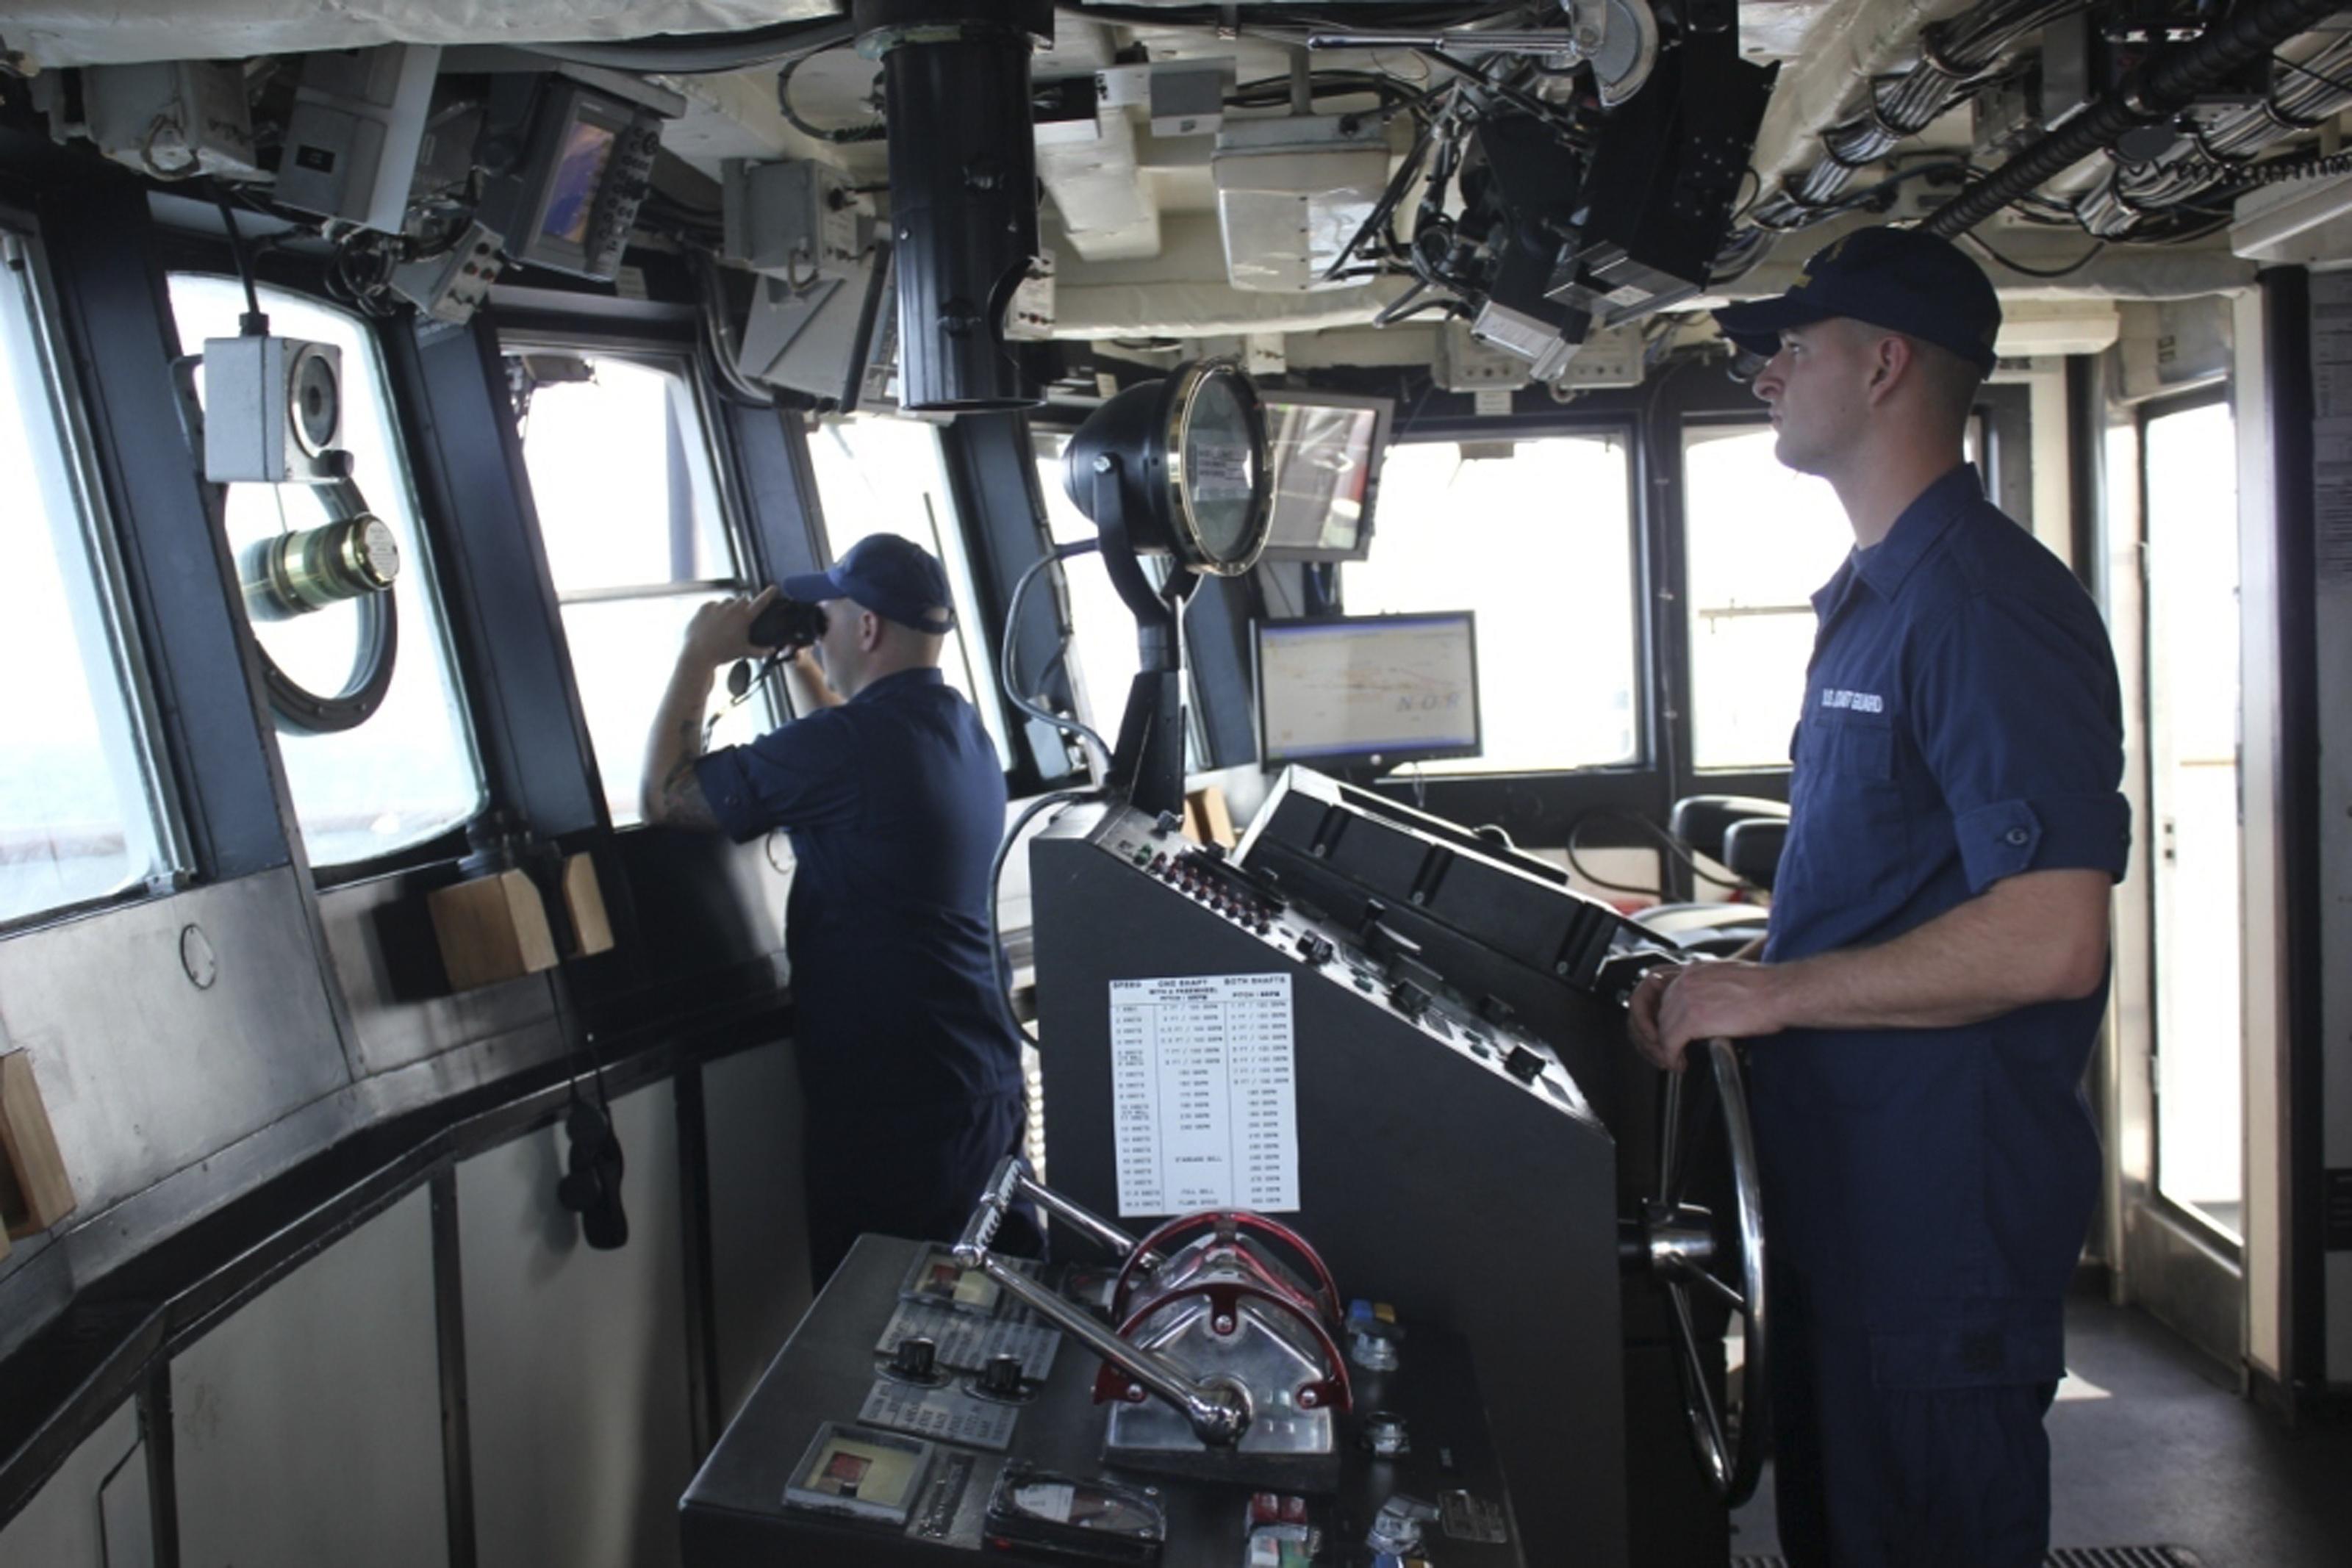 25. Sailors and Maritime Oilers